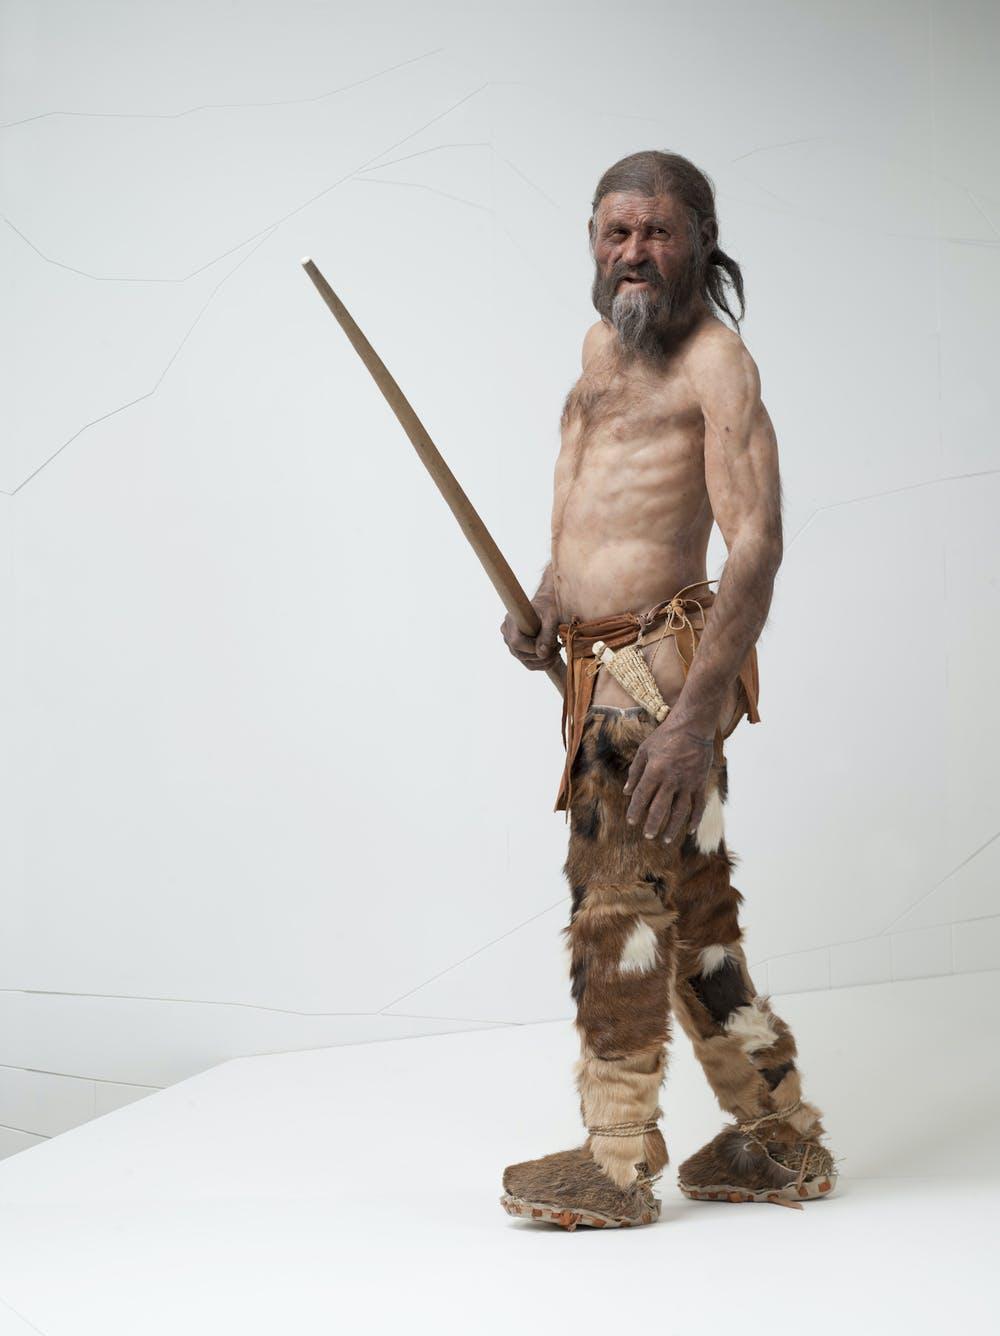 Reconstrucción del aspecto de Ötzi realizada por Alfons & Adrie Kennis. © South Tyrol Museum of Archaeology/Ochsenreiter